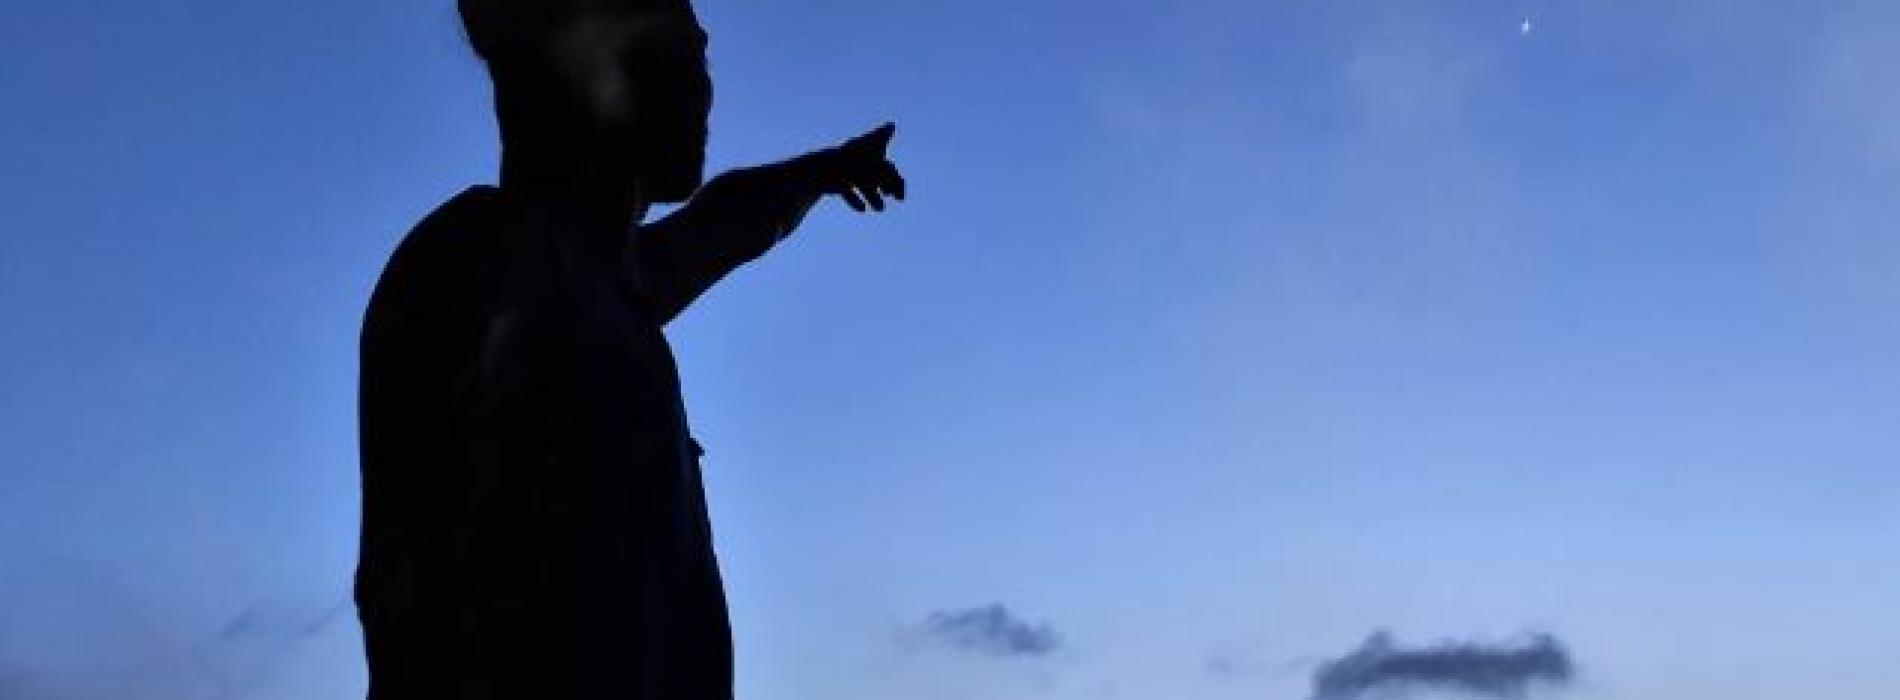 New Music : Lofi Trip Local ගමේ vibes by Thilina Blyz